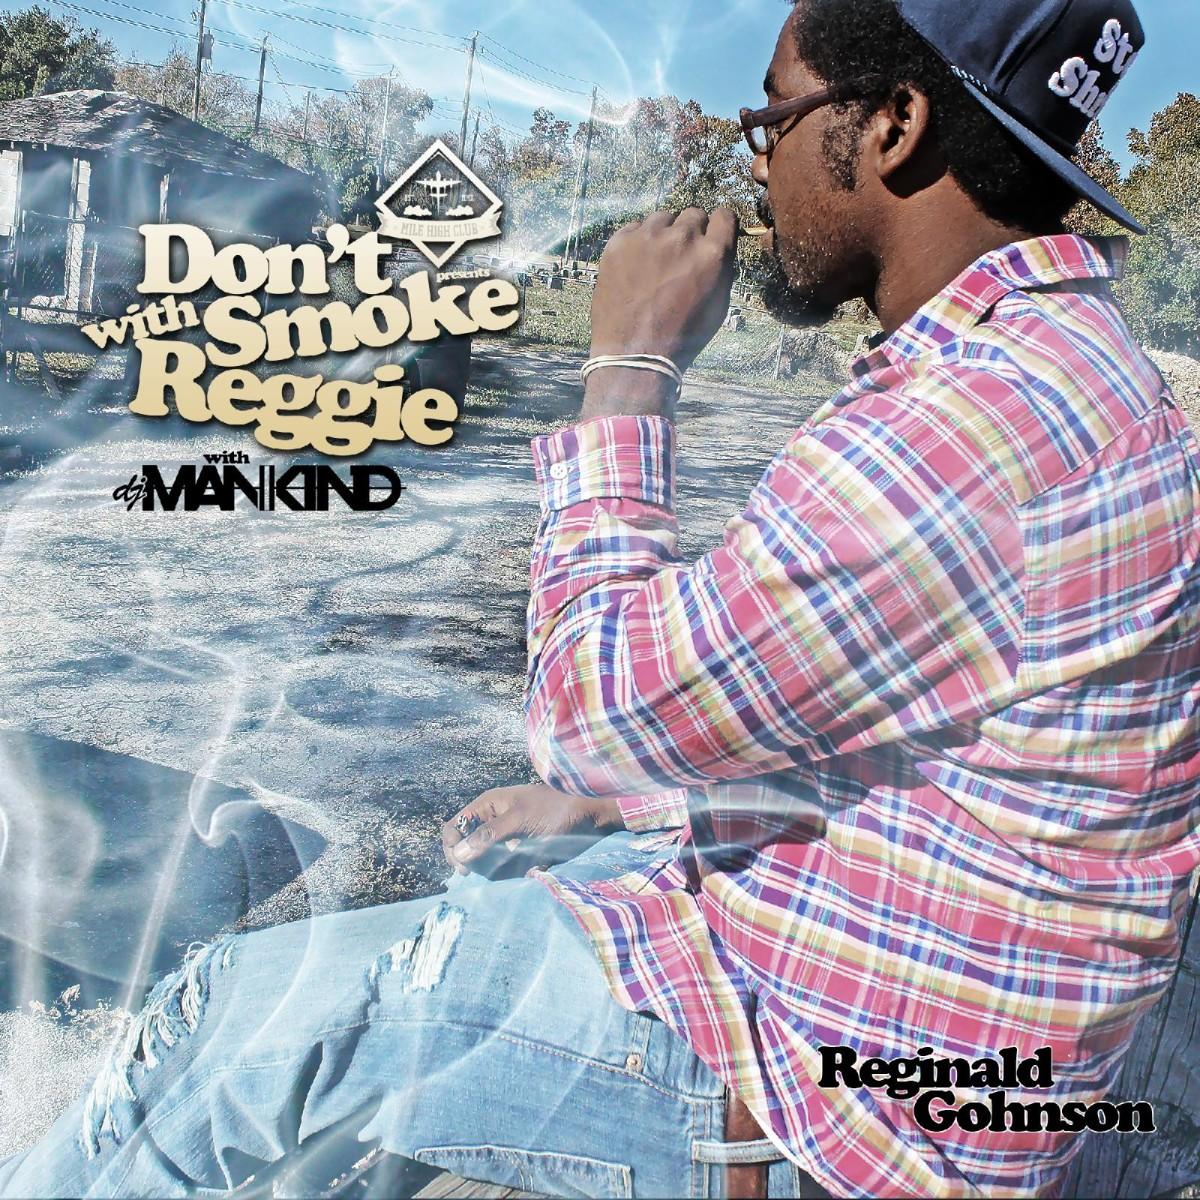 Don't Smoke With Reggie